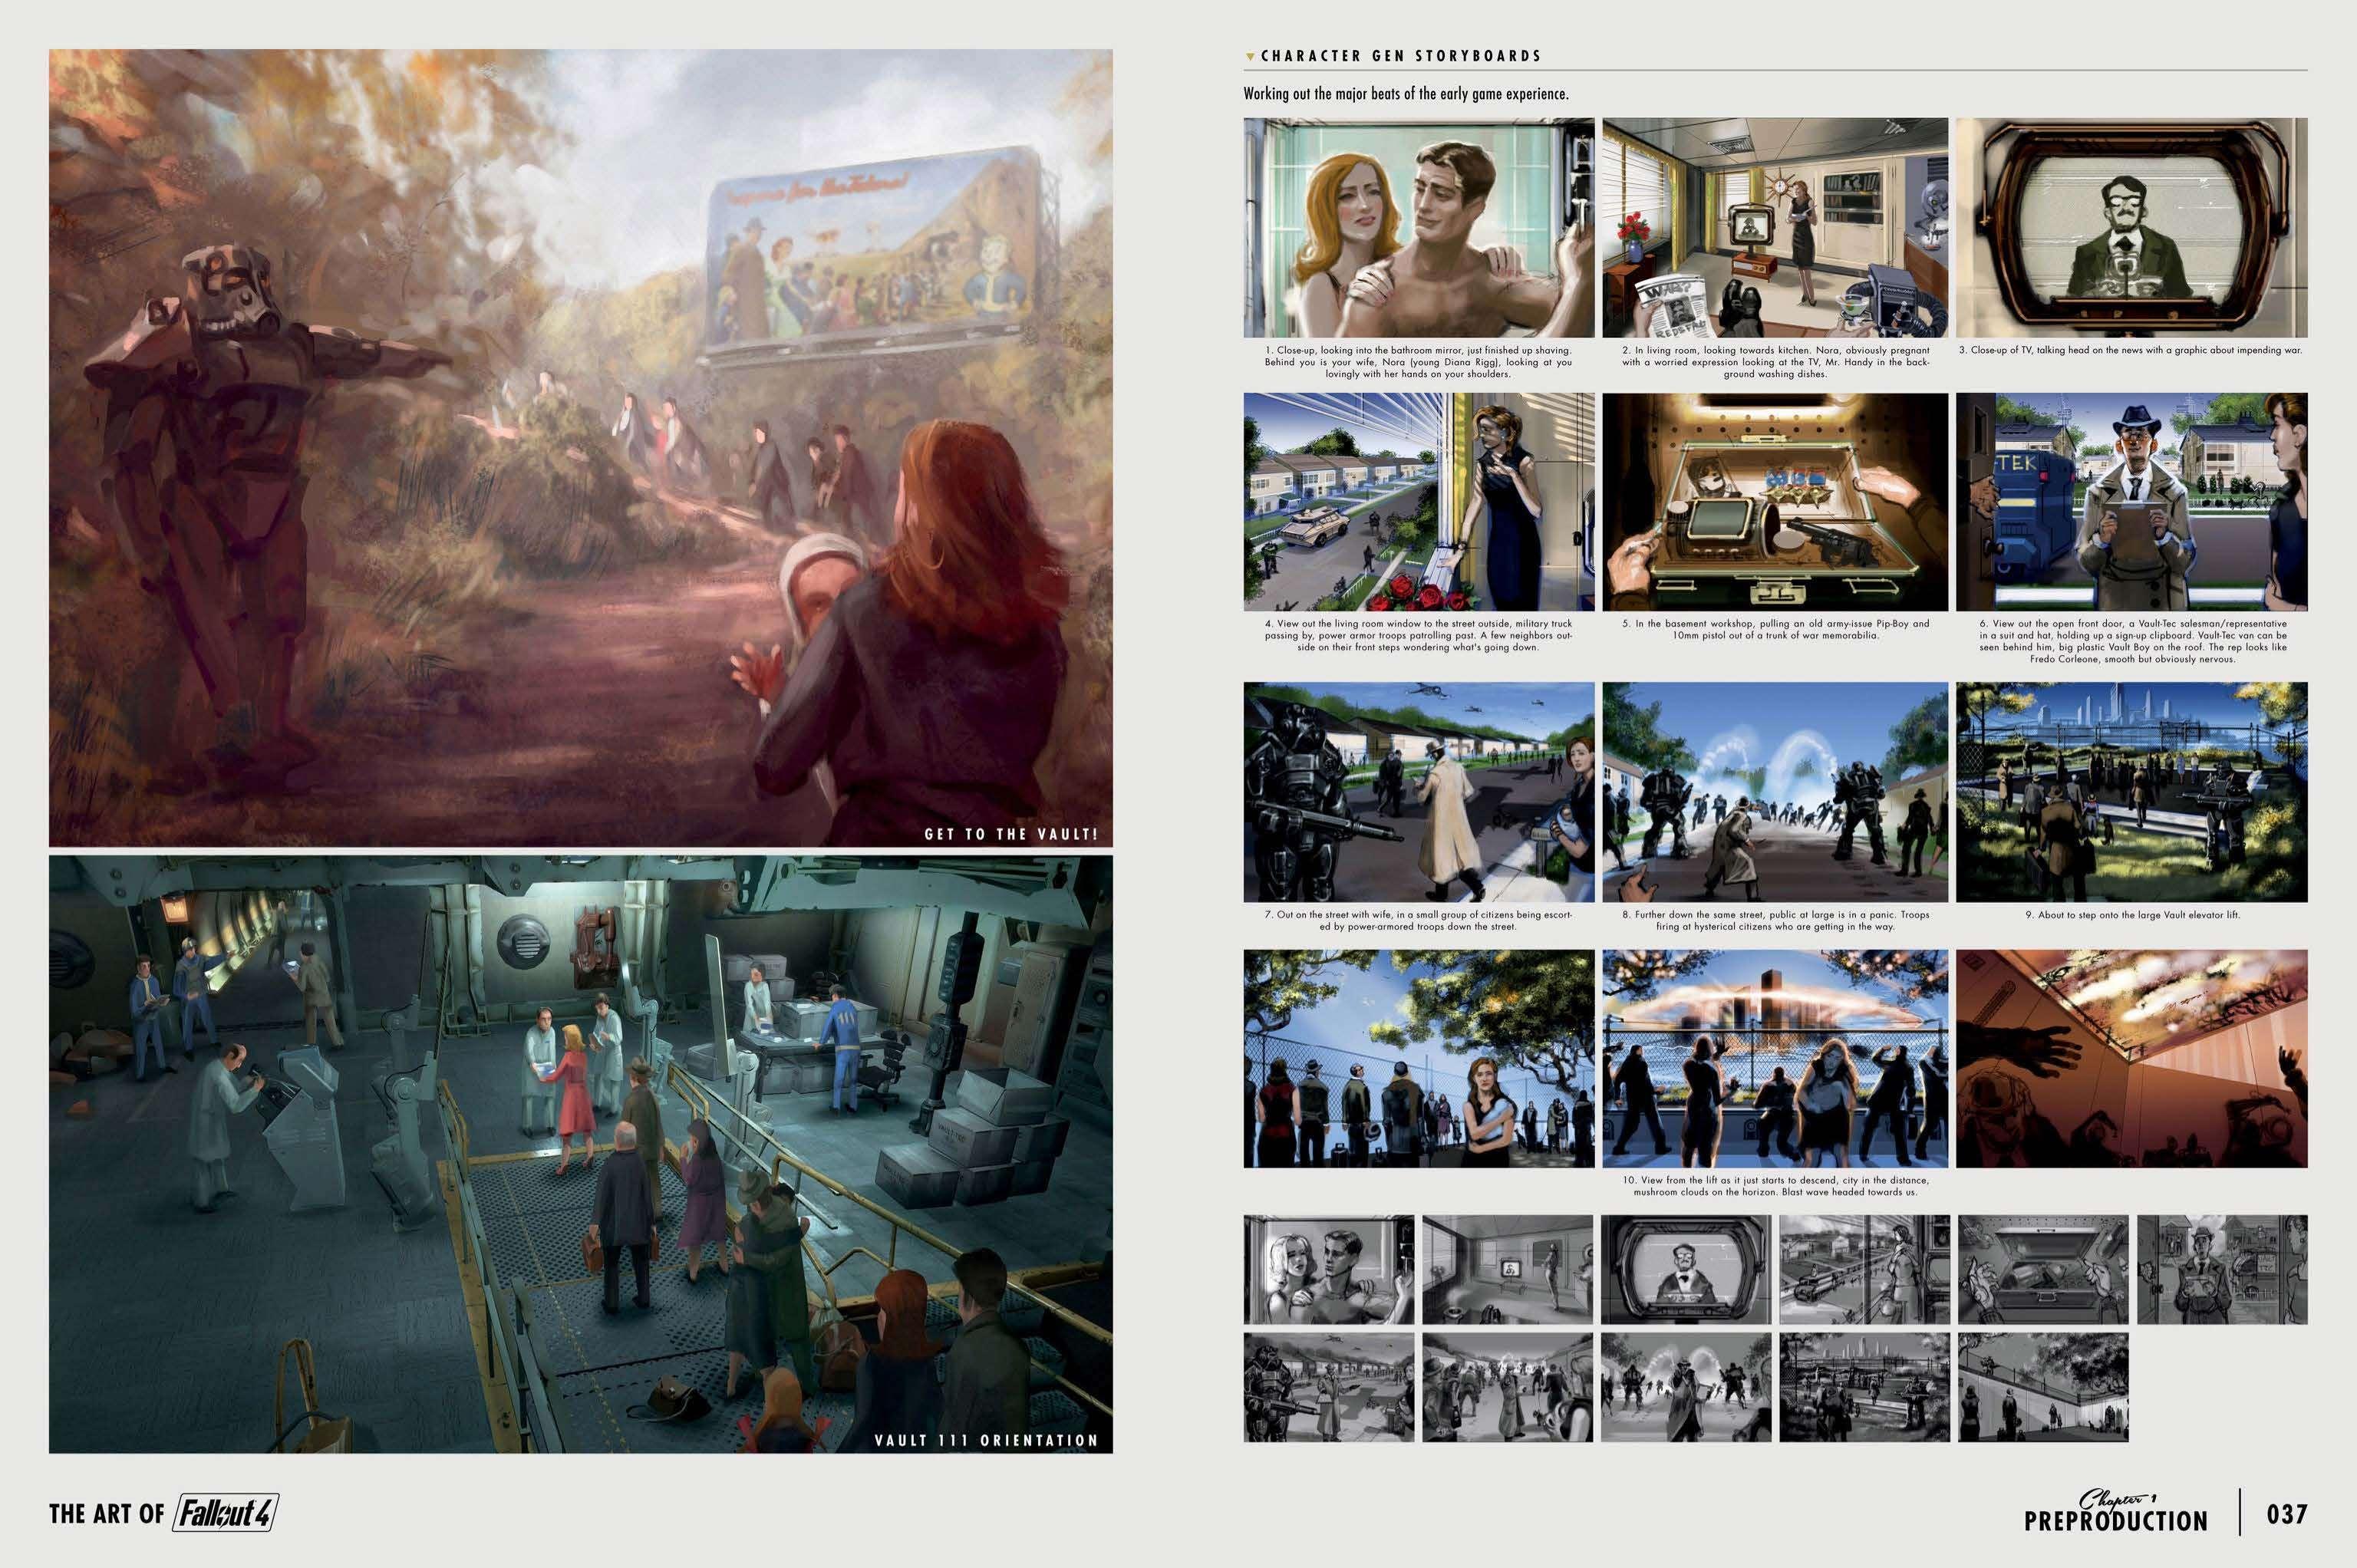 The Art of Fallout 4 - # 019 - Fallout 4 Артбук